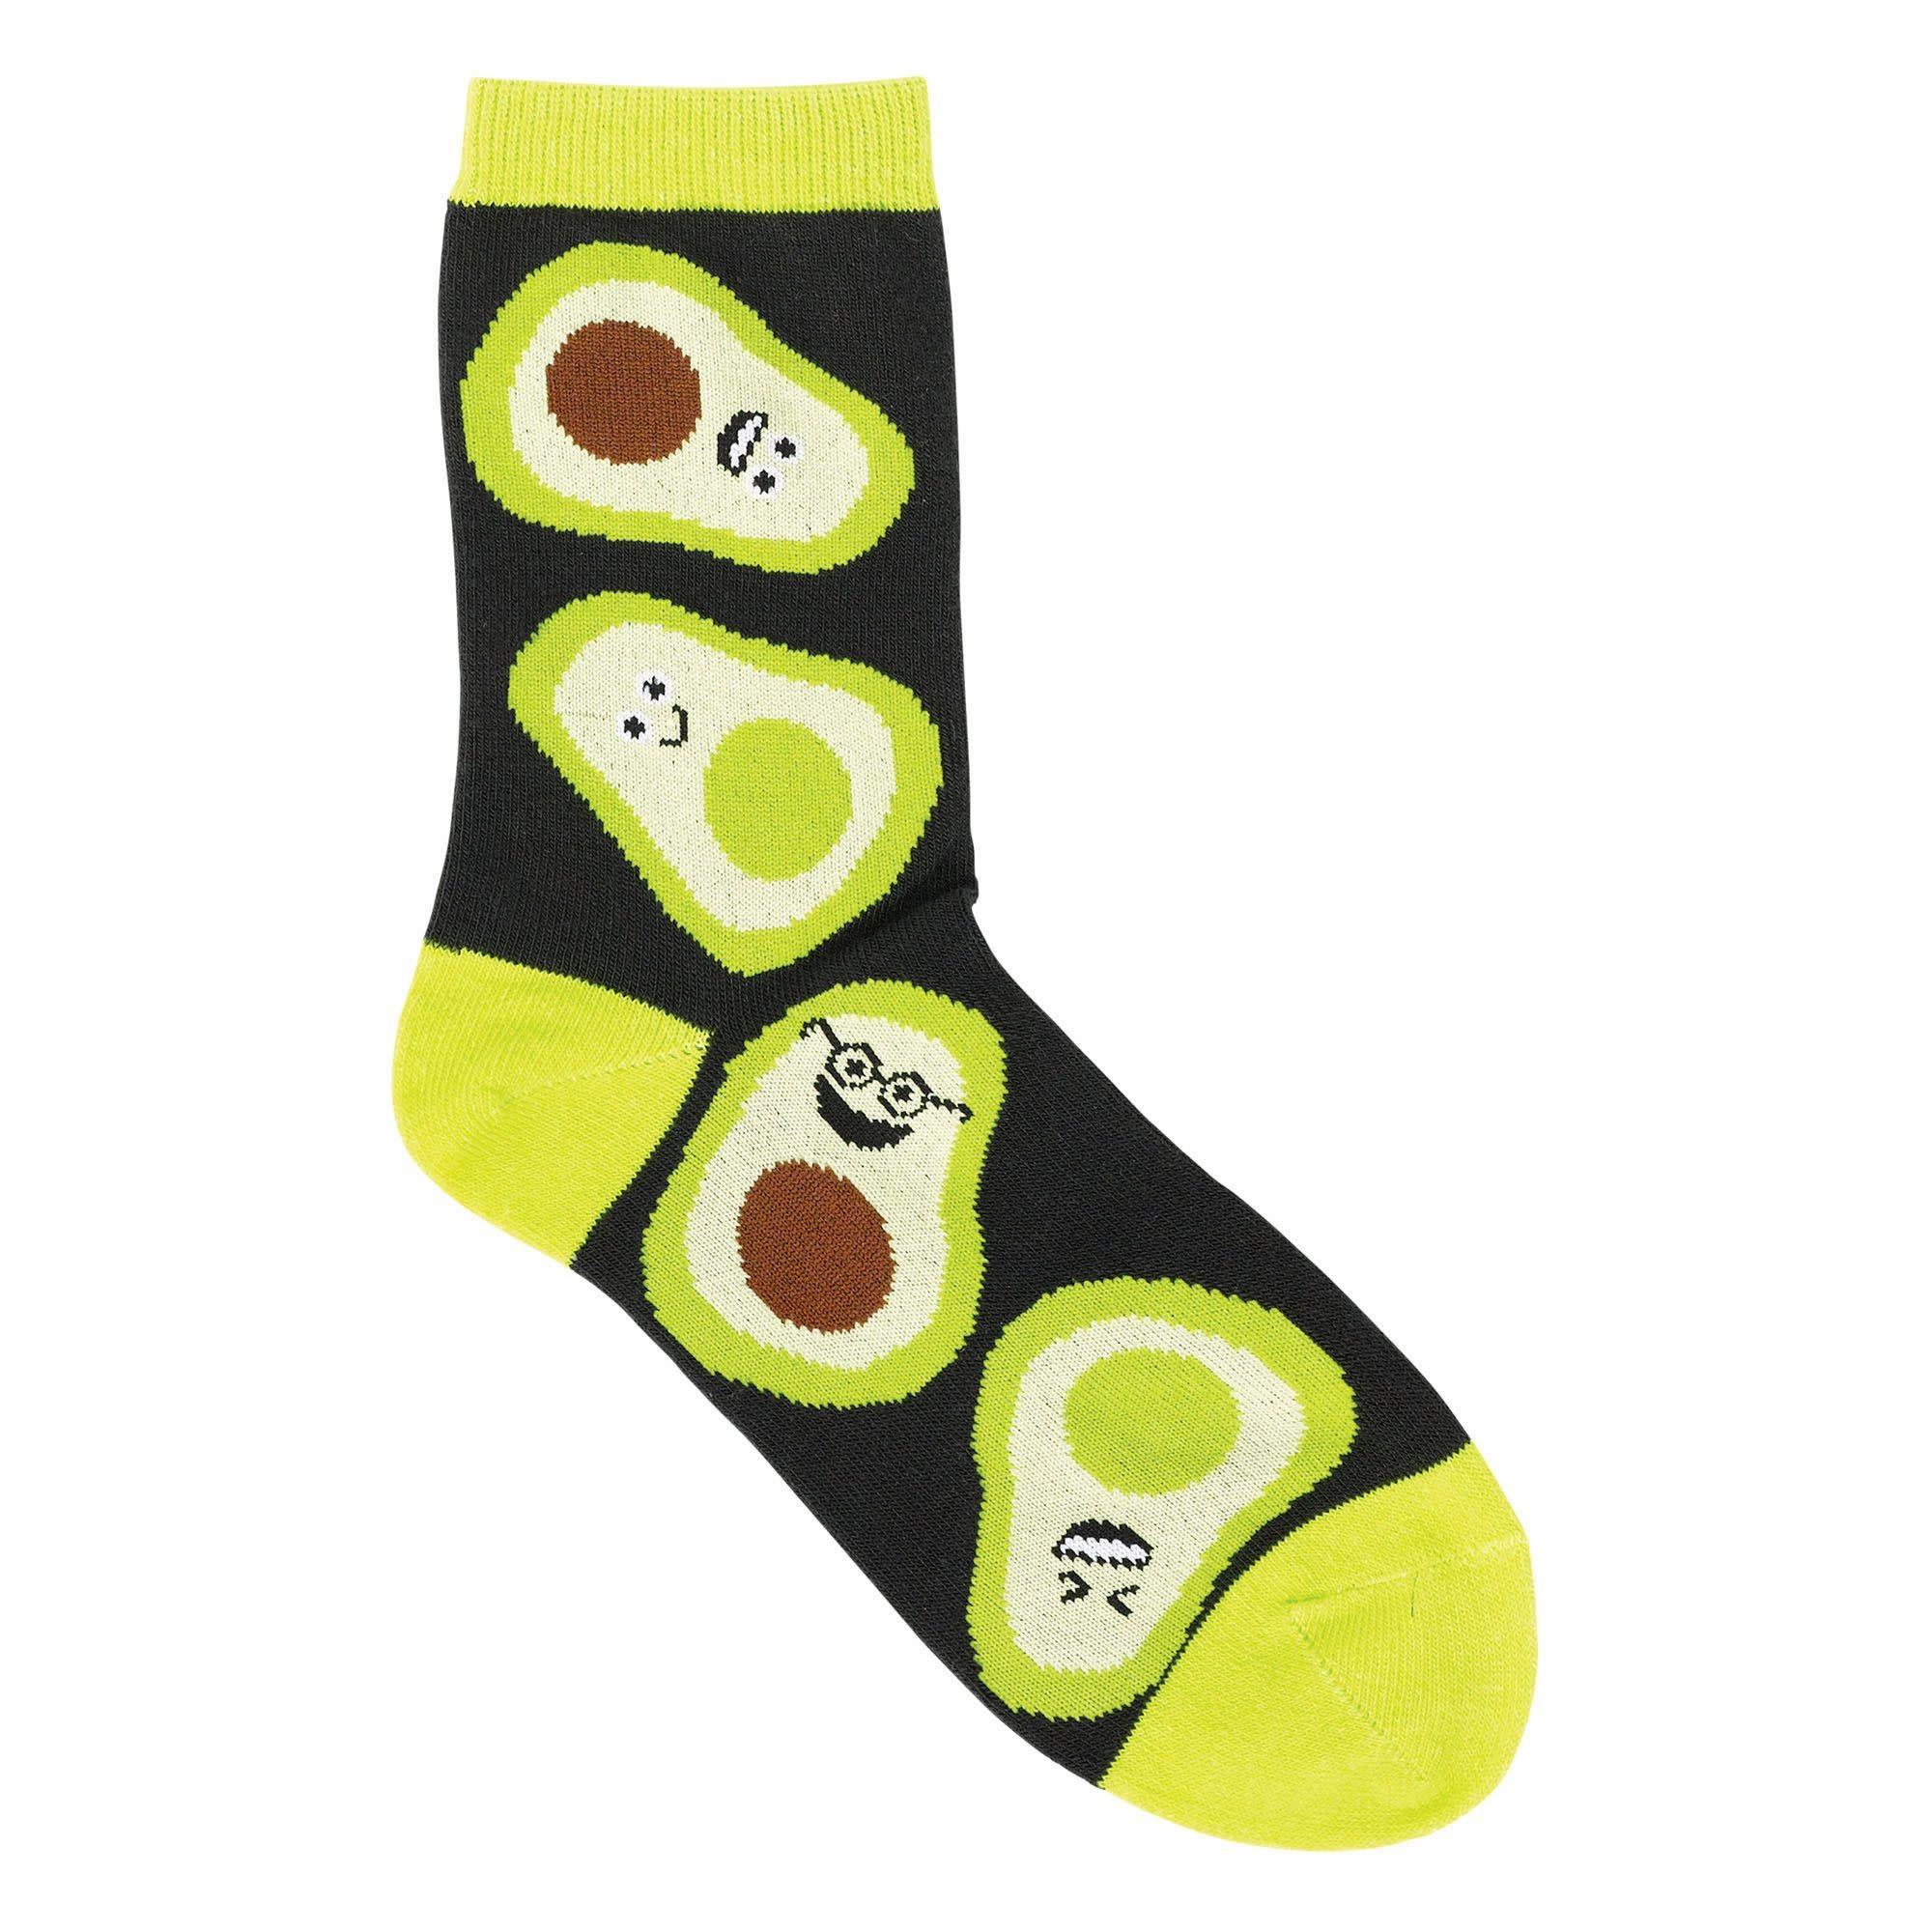 Avocado Crew Socks